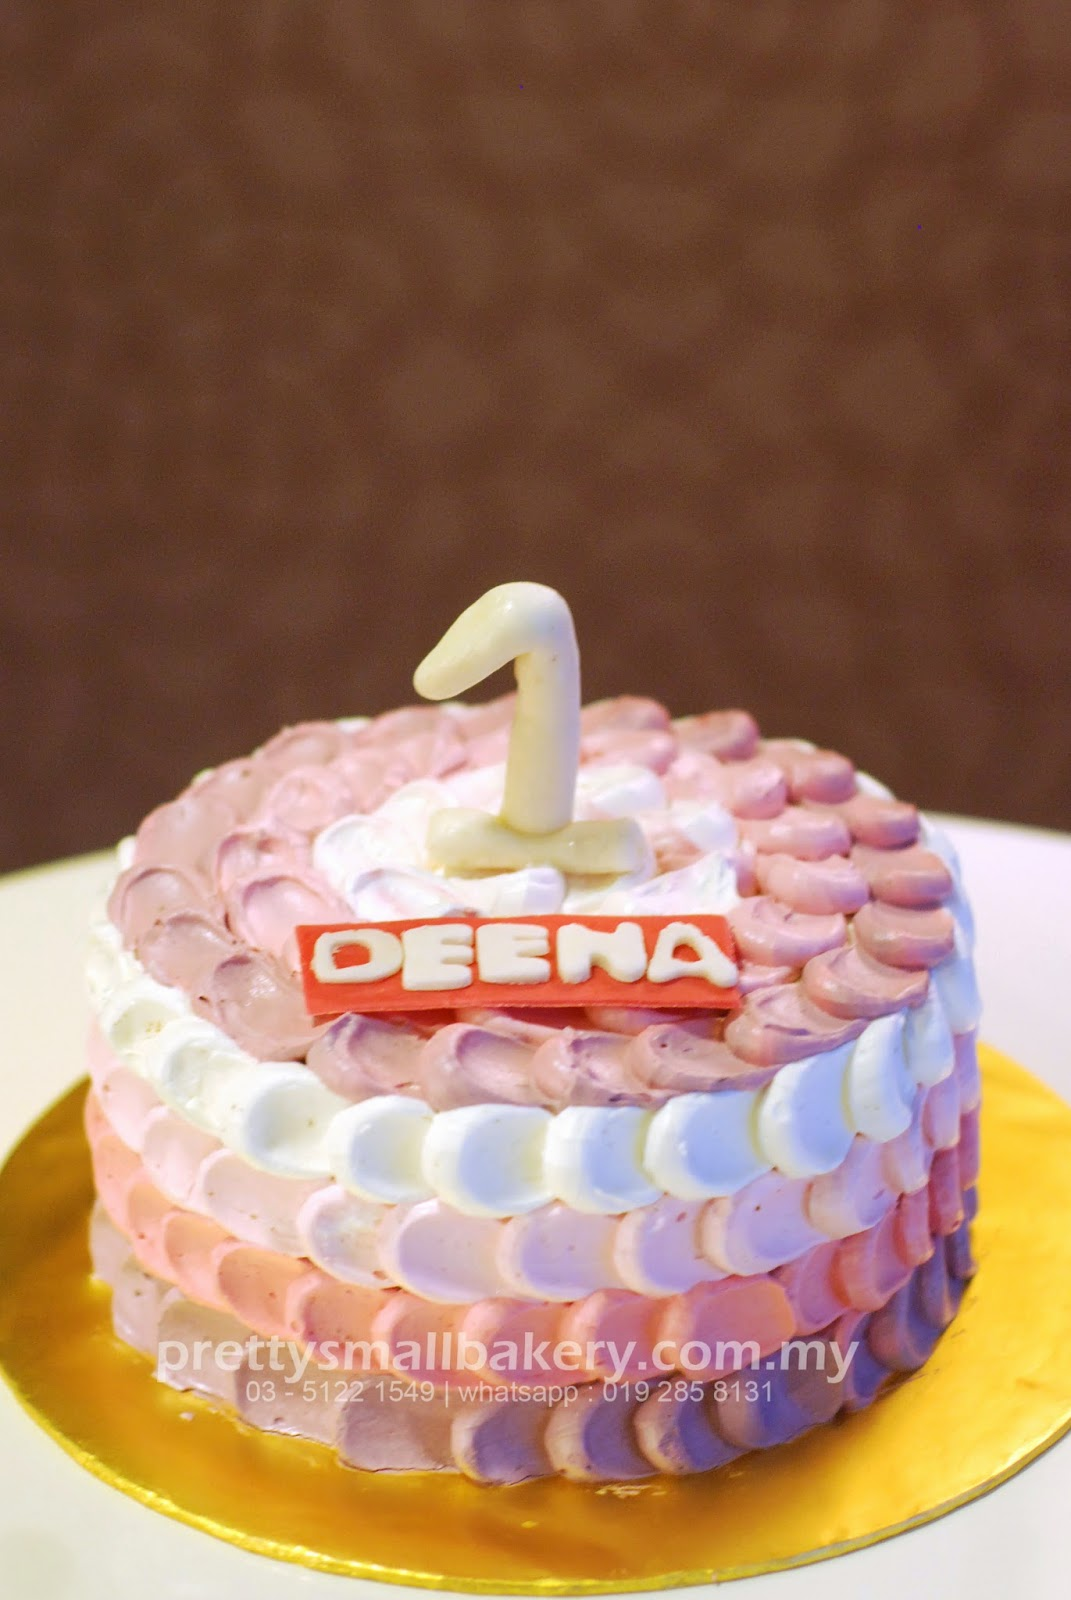 kek birthday simple  Prettysmallbakery